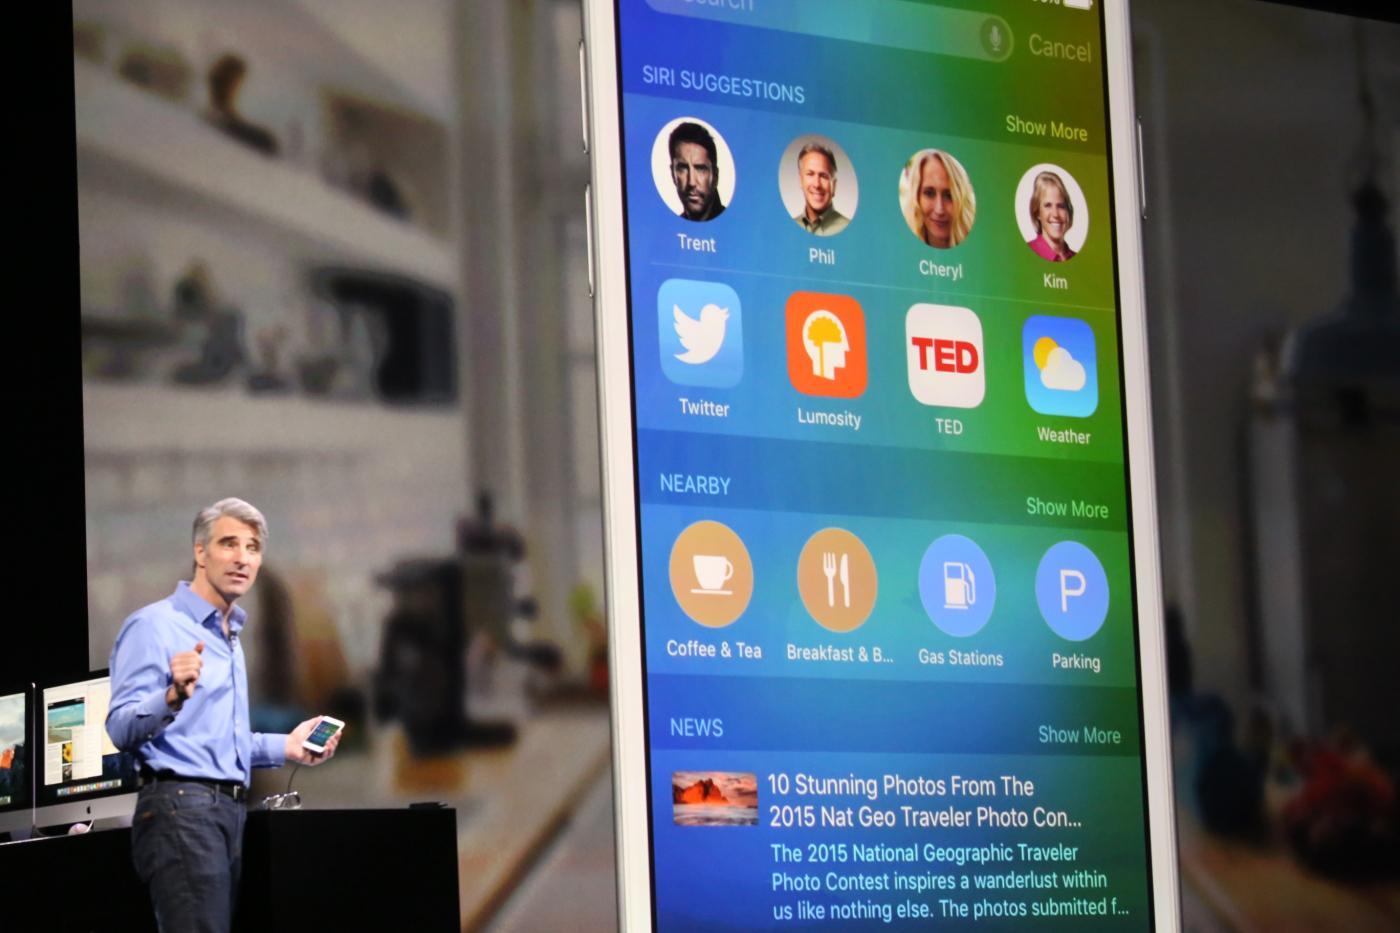 Коротко: Презентация Apple за 90 секунд